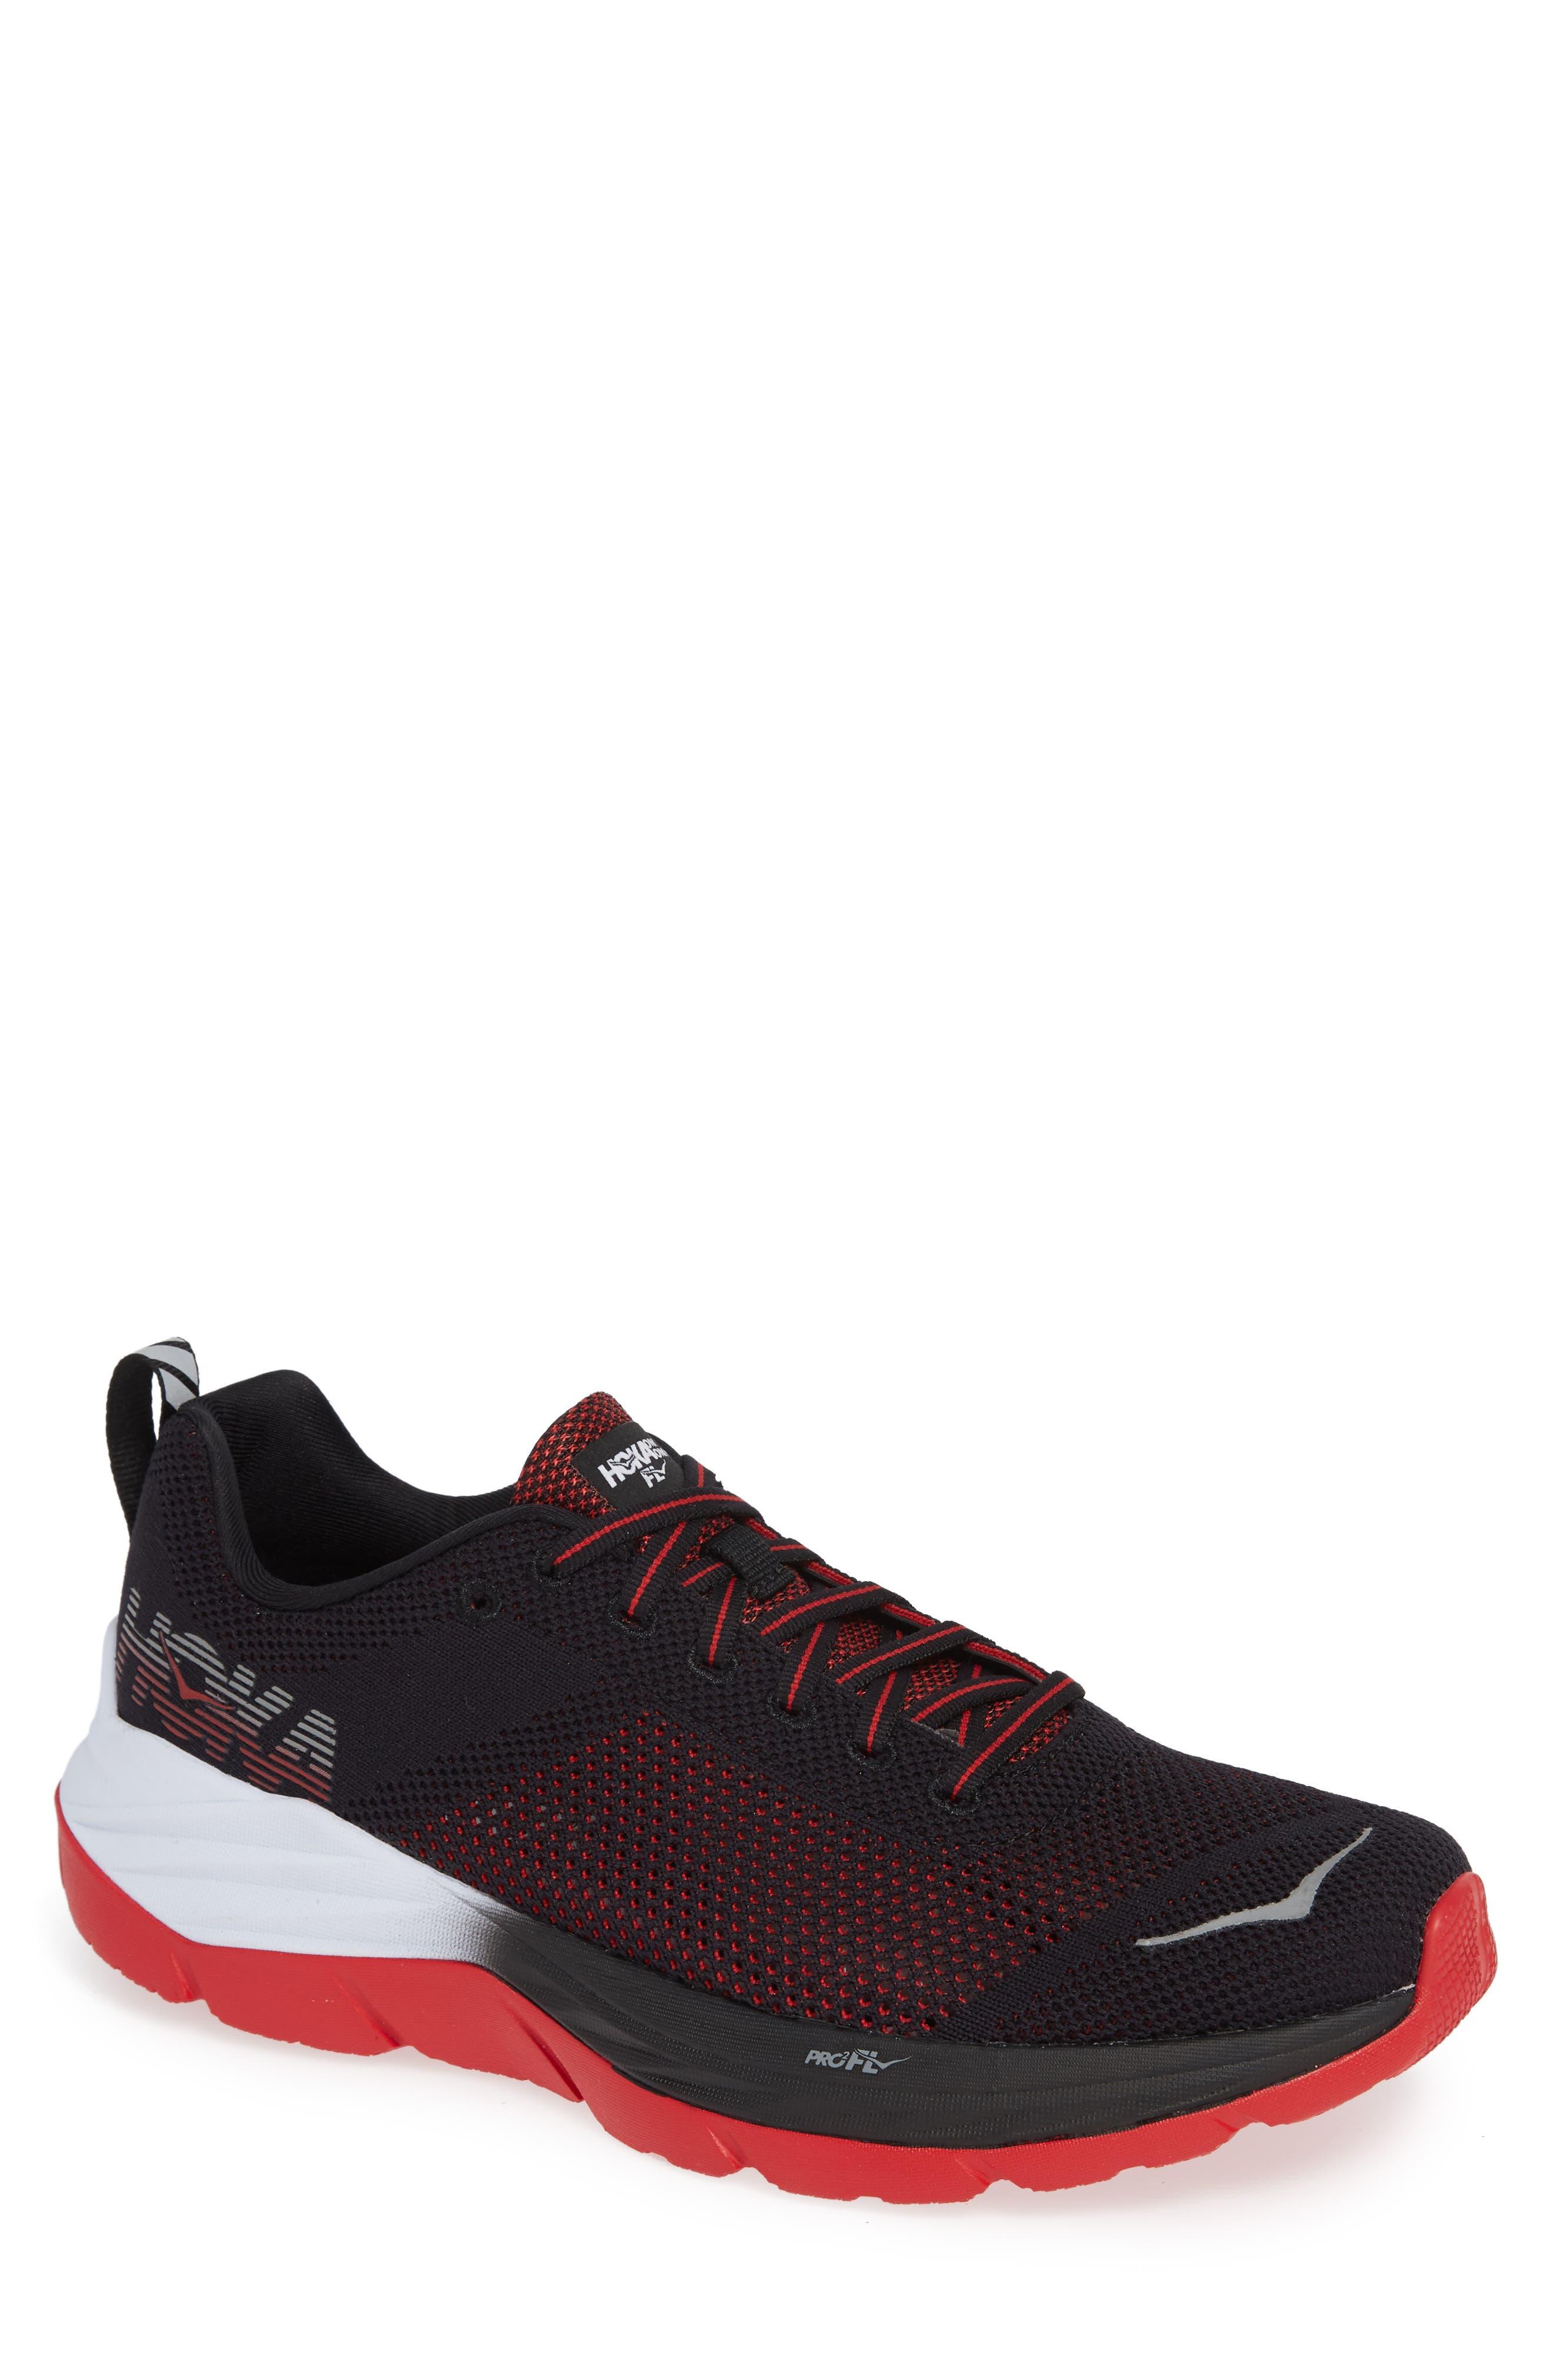 Mach Running Shoe,                             Main thumbnail 1, color,                             BLACK/ WHITE